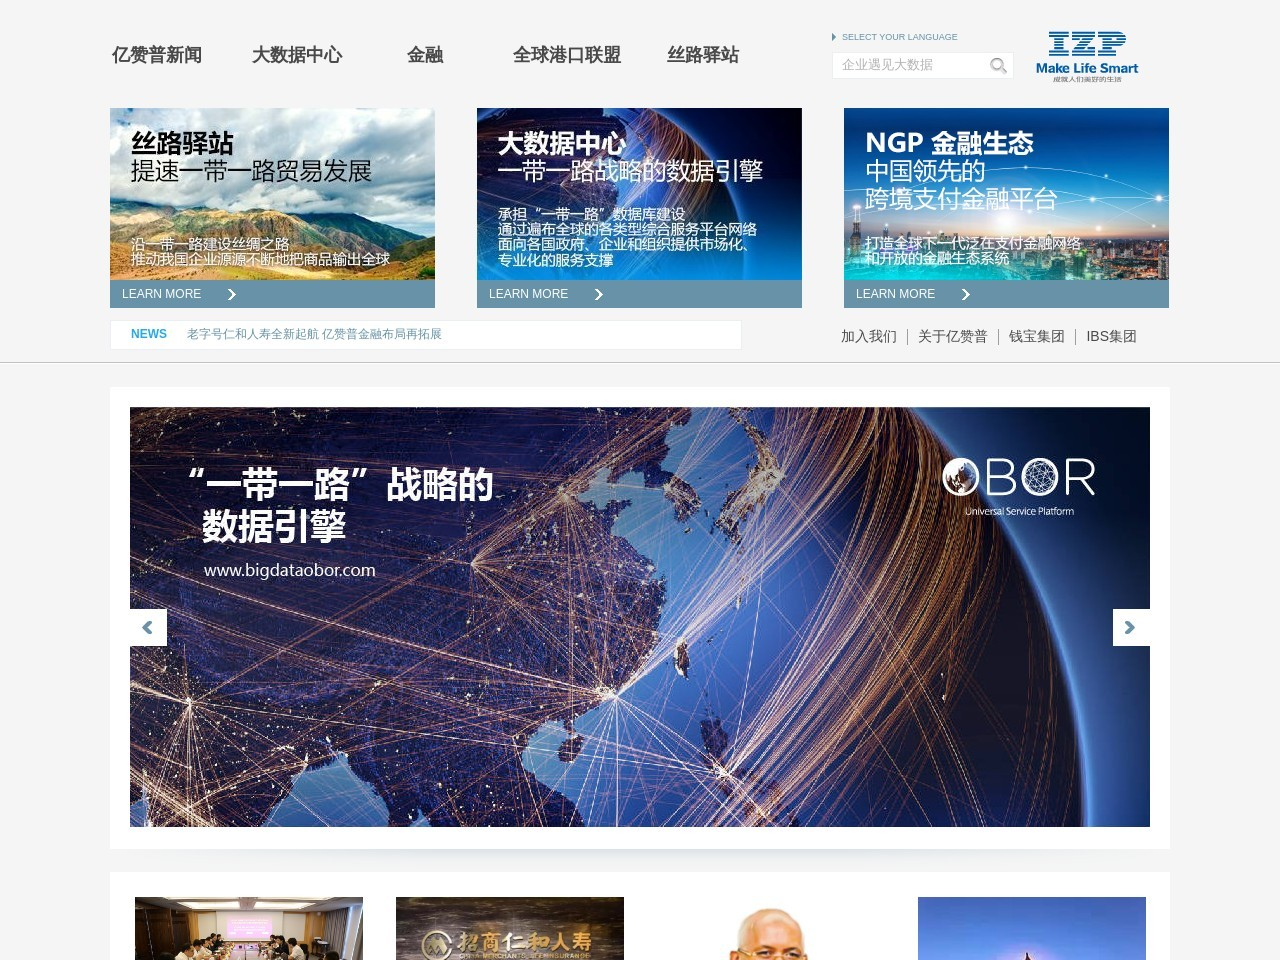 亿赞普DSP广告平台